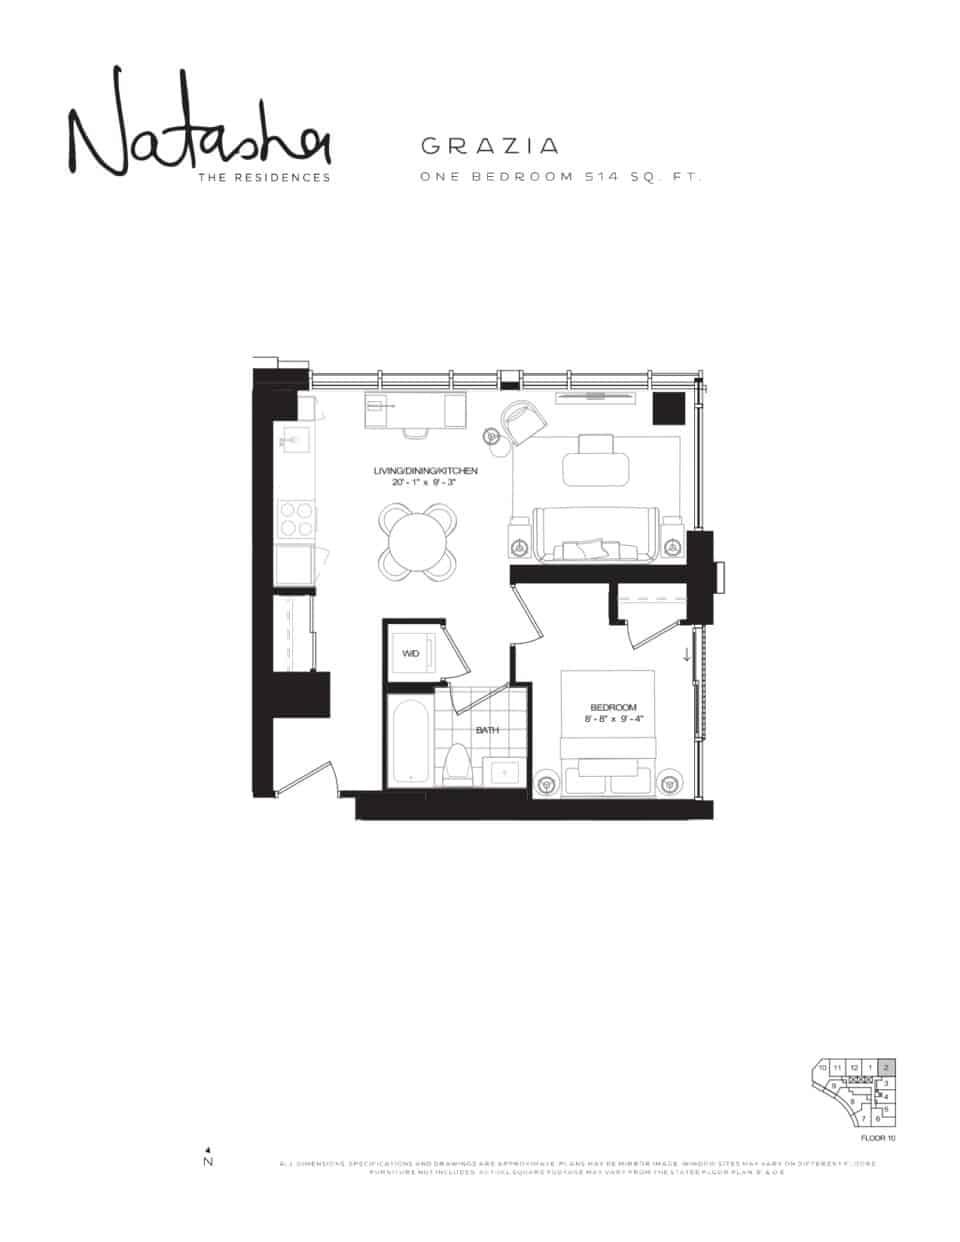 2021 09 02 11 02 17 natashatheresidences lanterradevelopments floorplans grazia